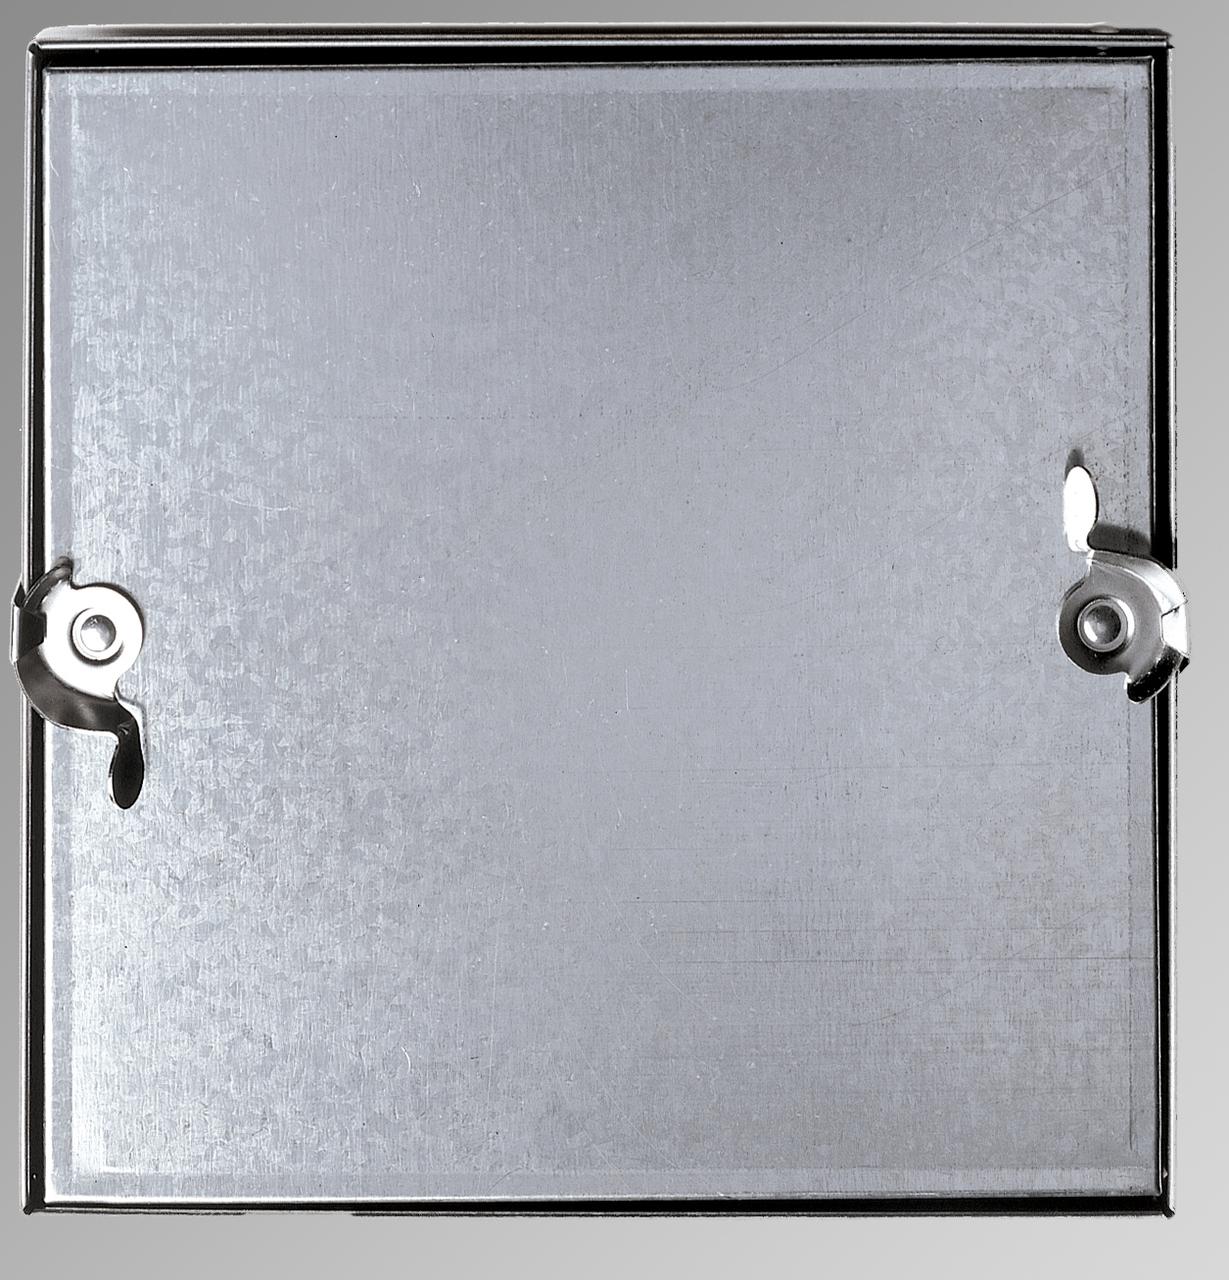 Acudor cd 5080 access door 10 x 10 double cam removeable for 10x10 access door